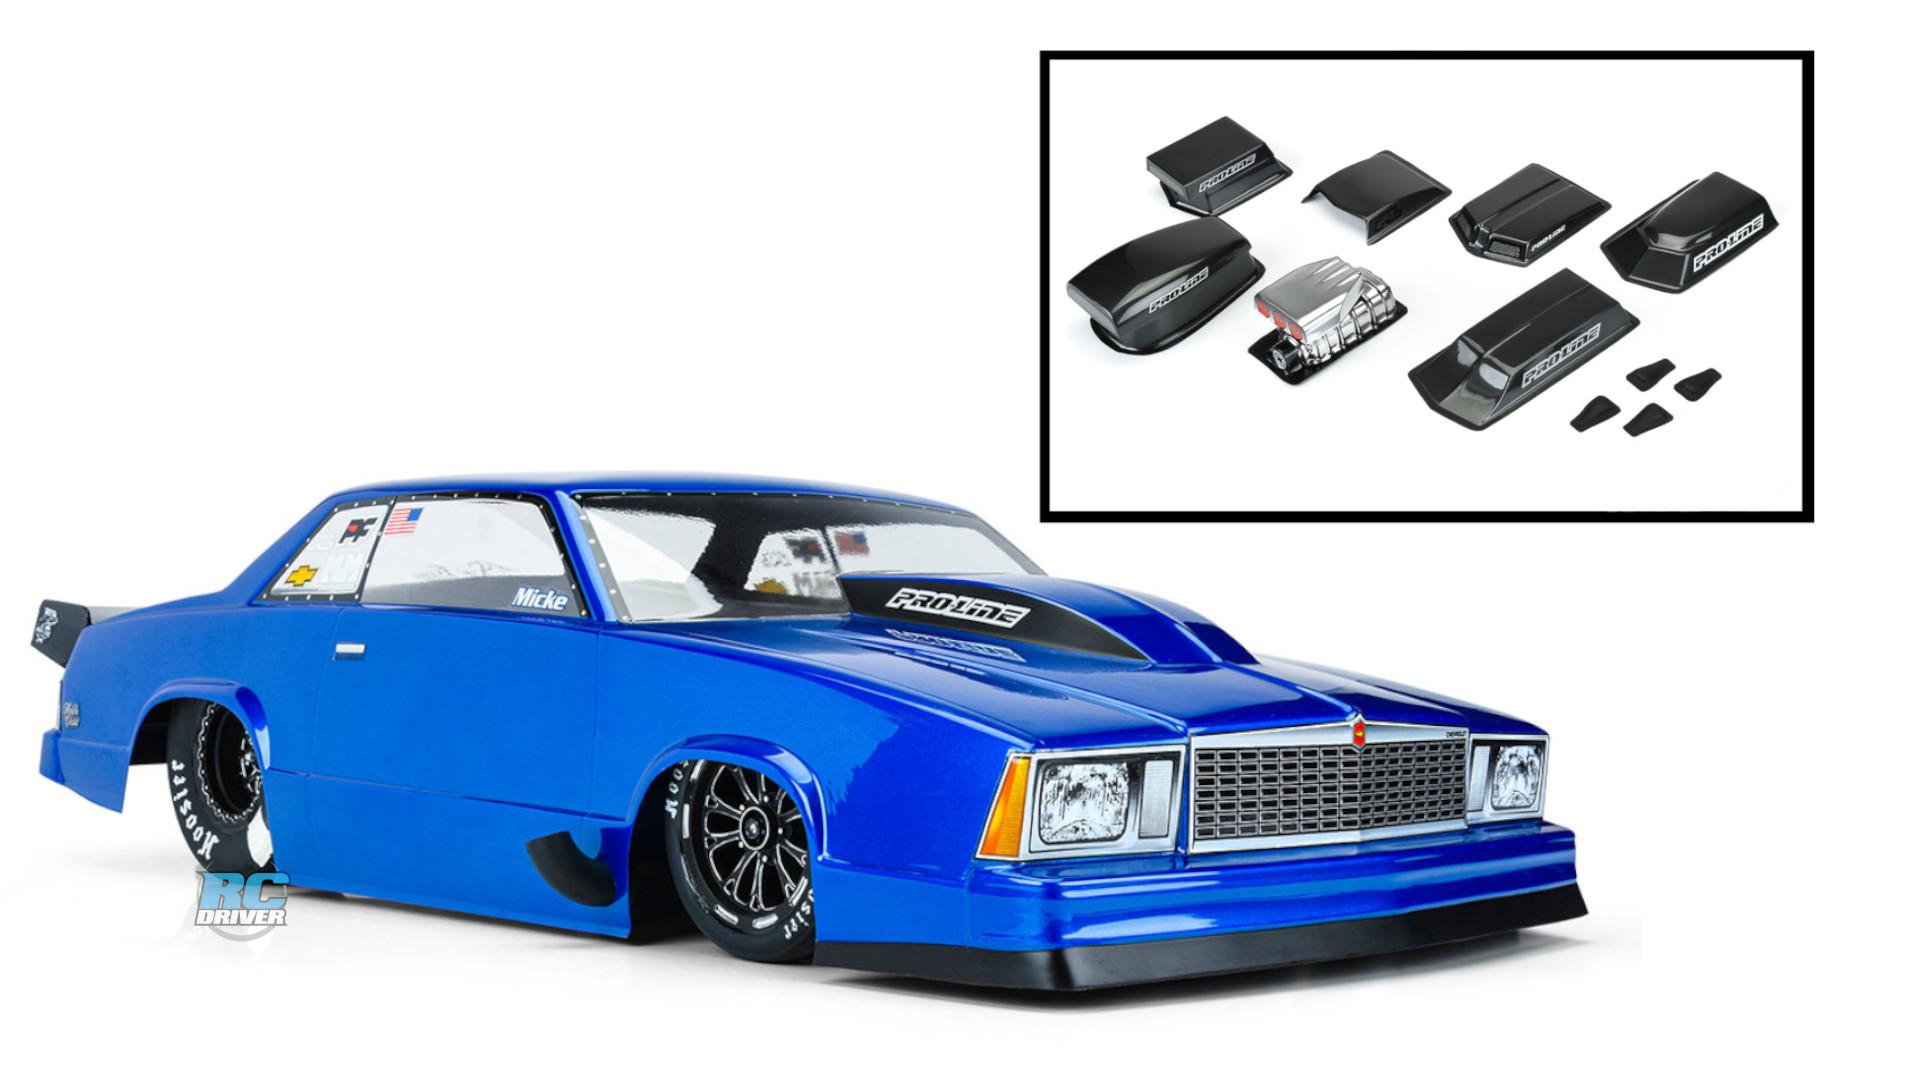 Pro-Line 1978 Chevrolet Malibu drag body & optional hood scoops/blowers